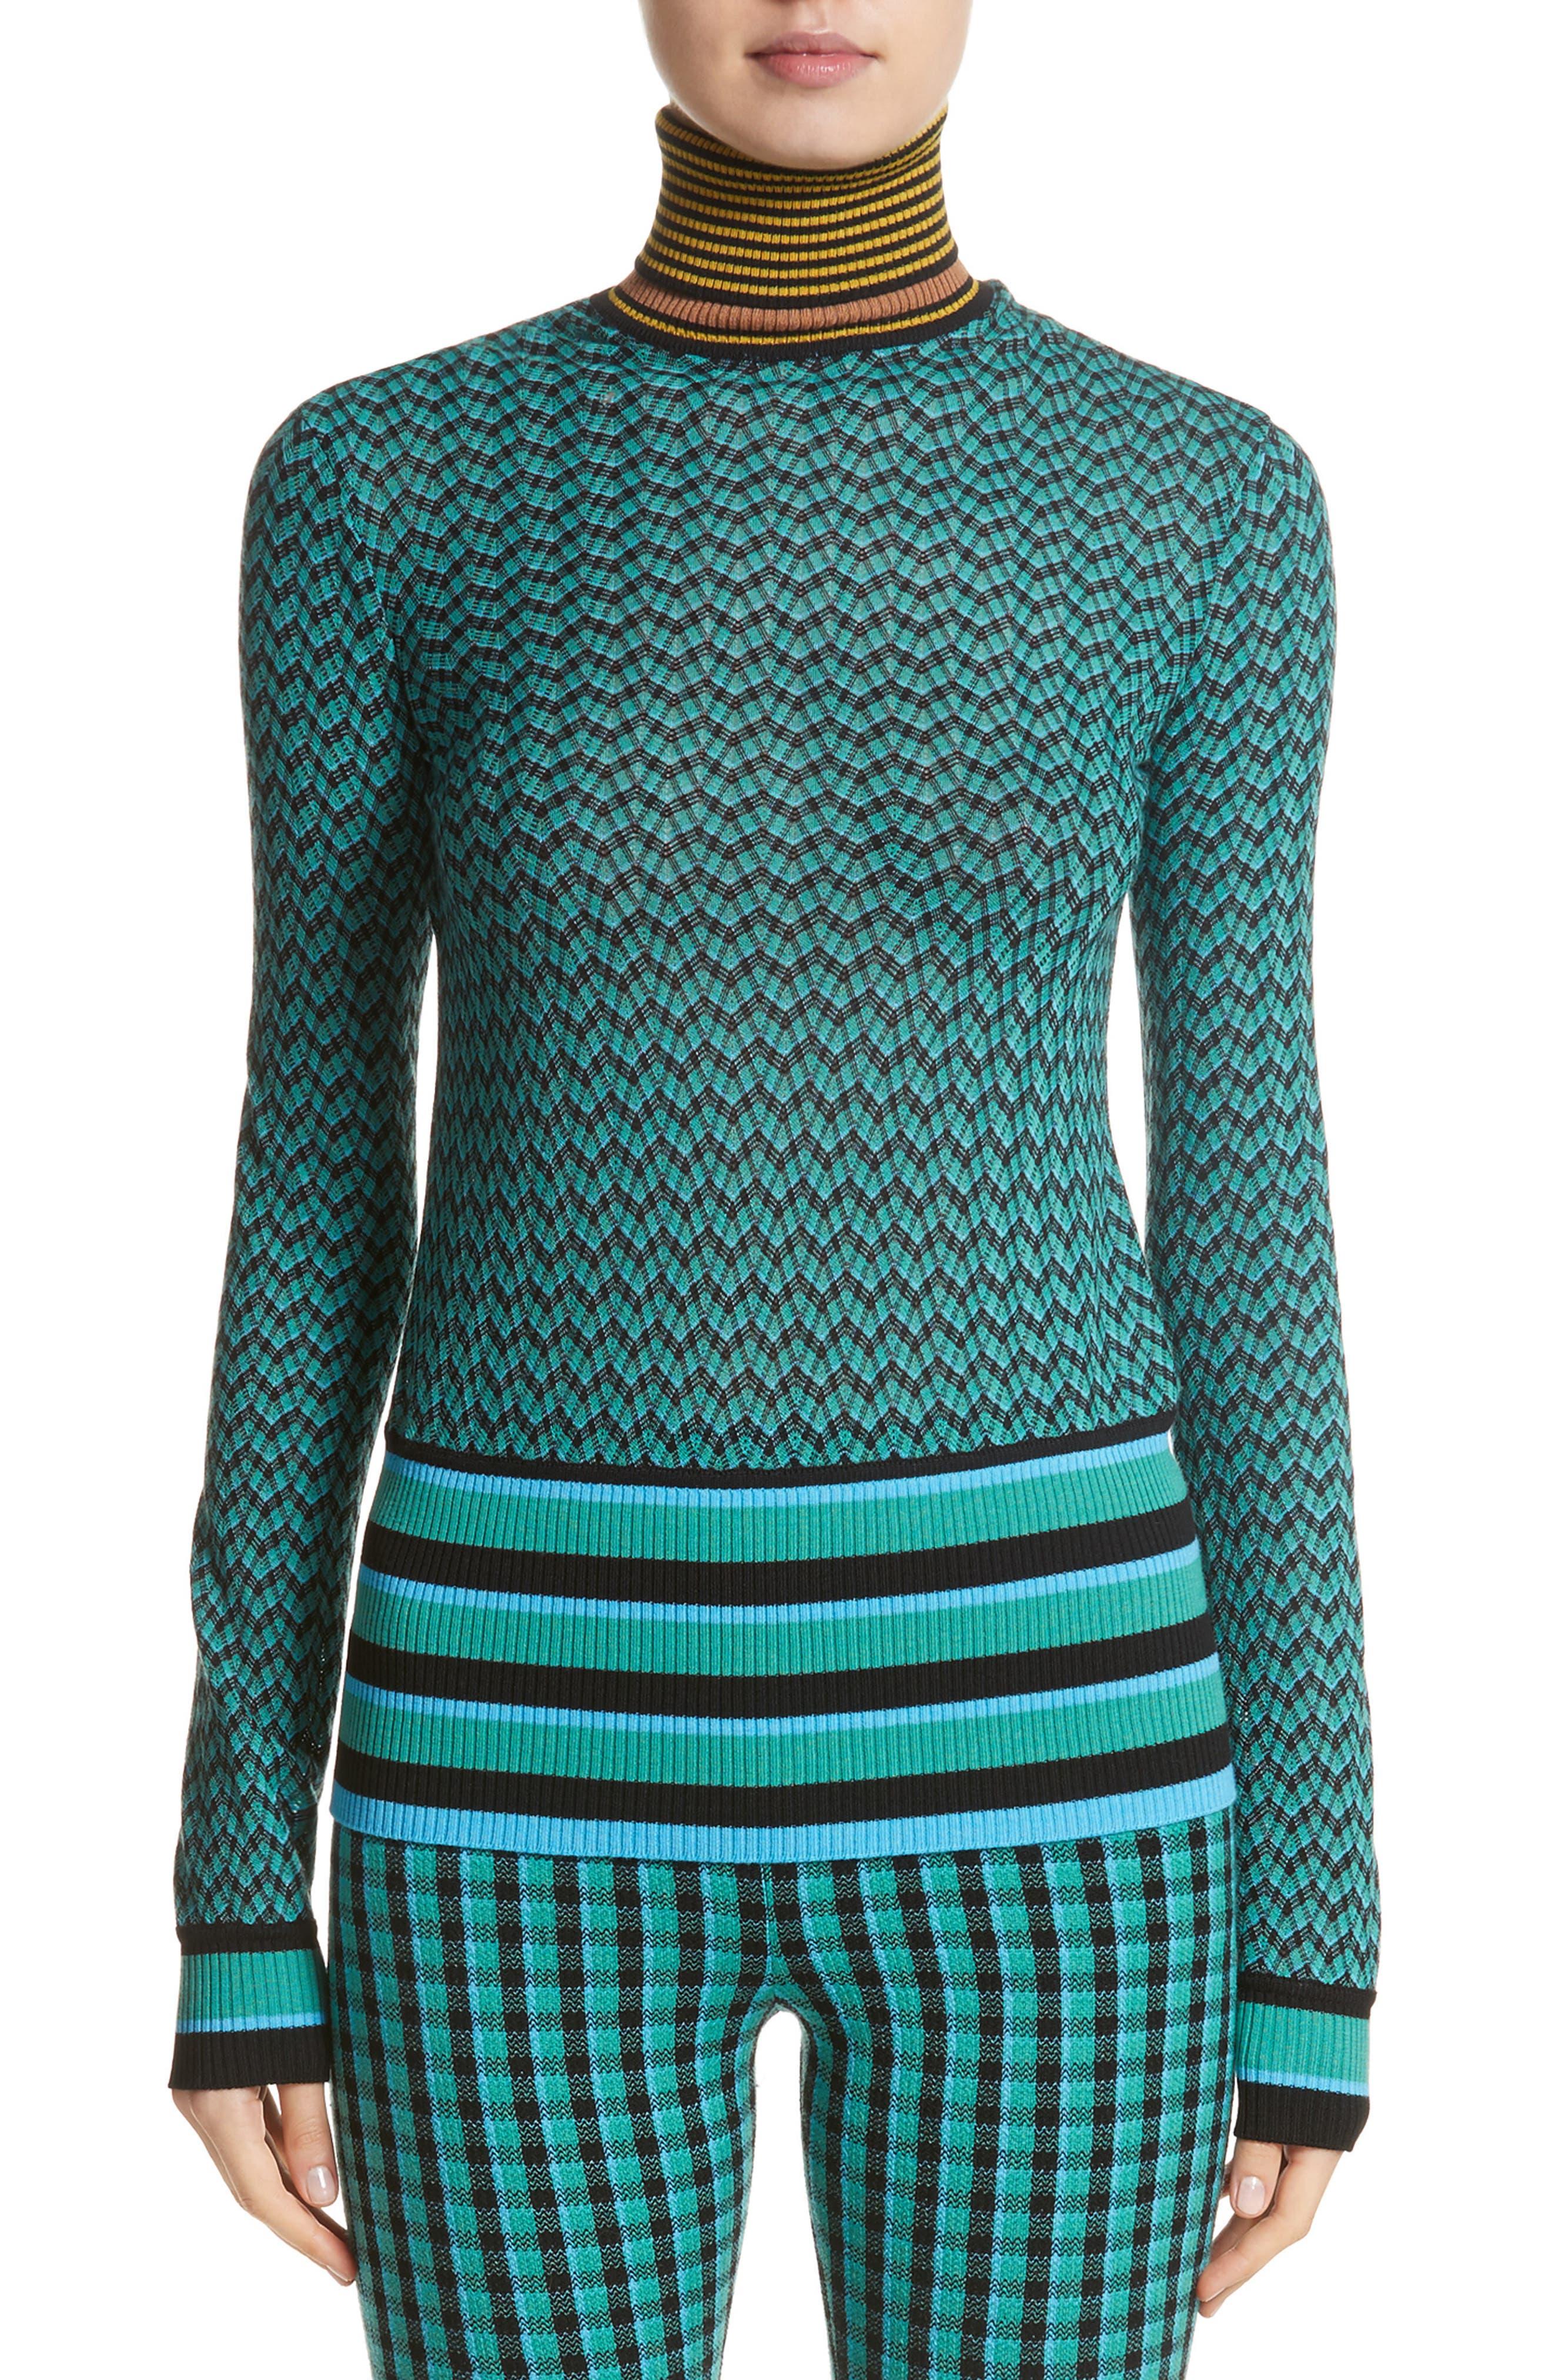 Zigzag & Stripe Mock Neck Sweater,                             Main thumbnail 1, color,                             Green/ Blue